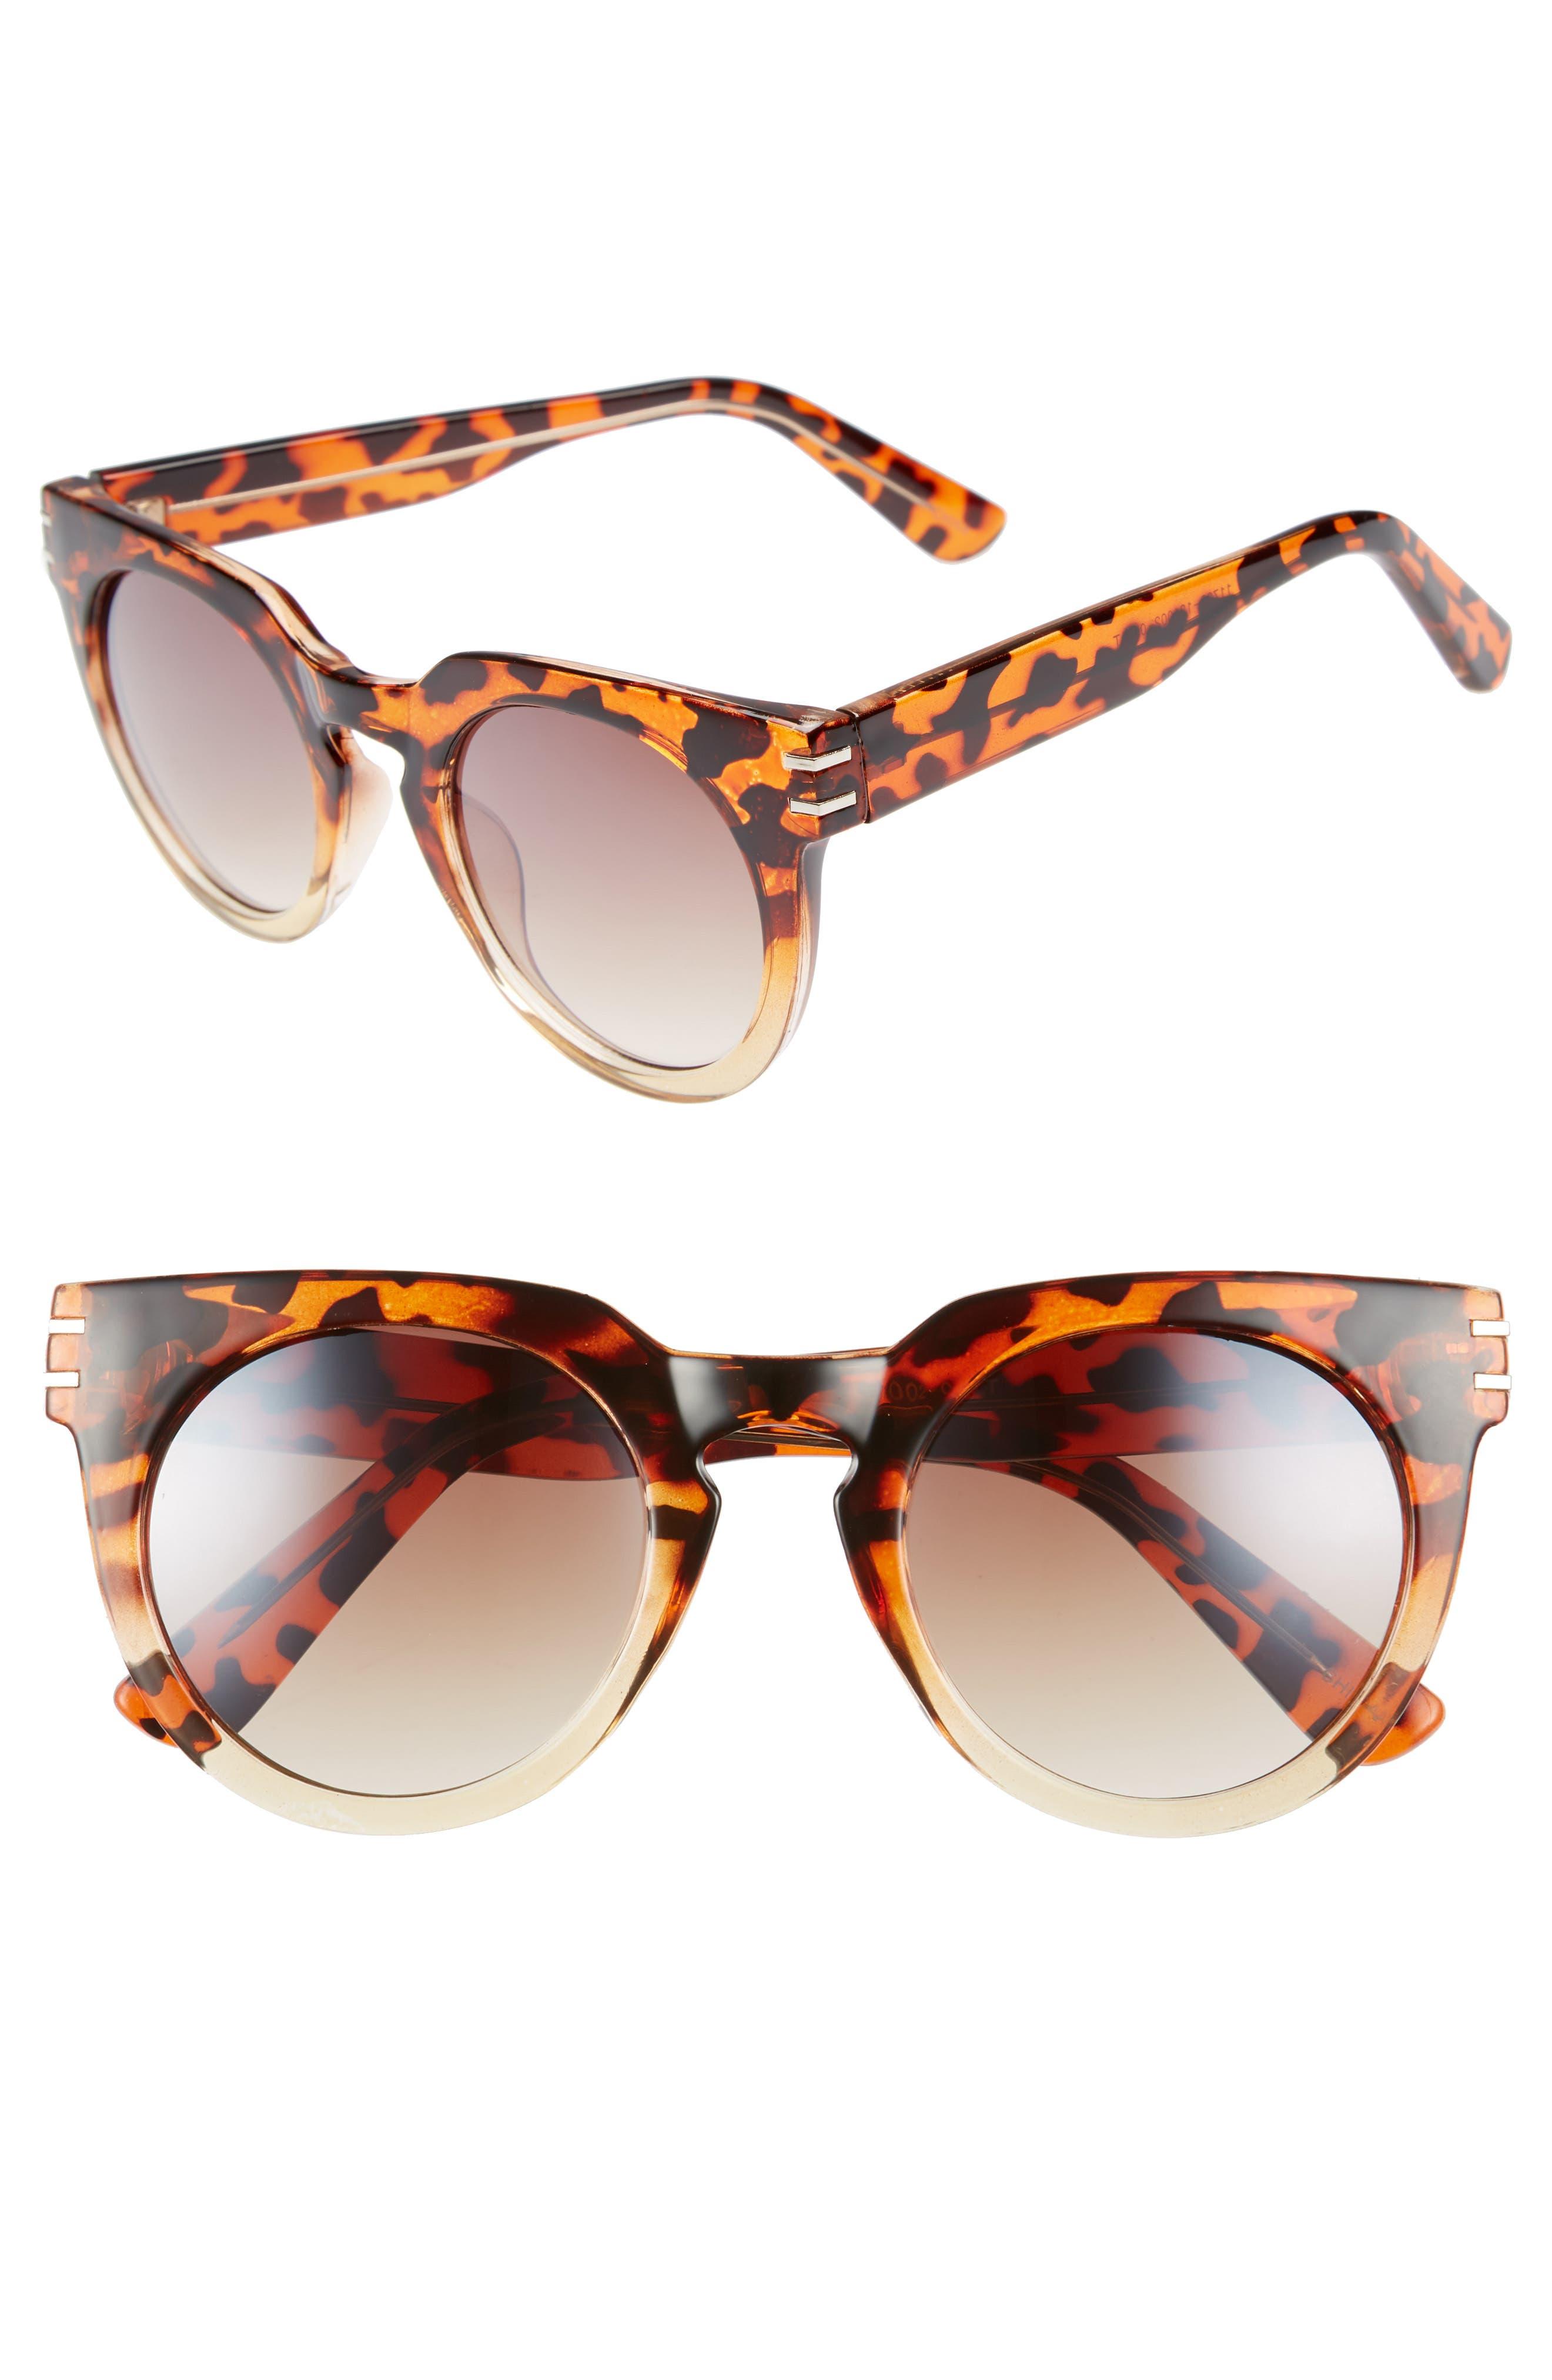 50mm Round Sunglasses,                             Main thumbnail 1, color,                             200